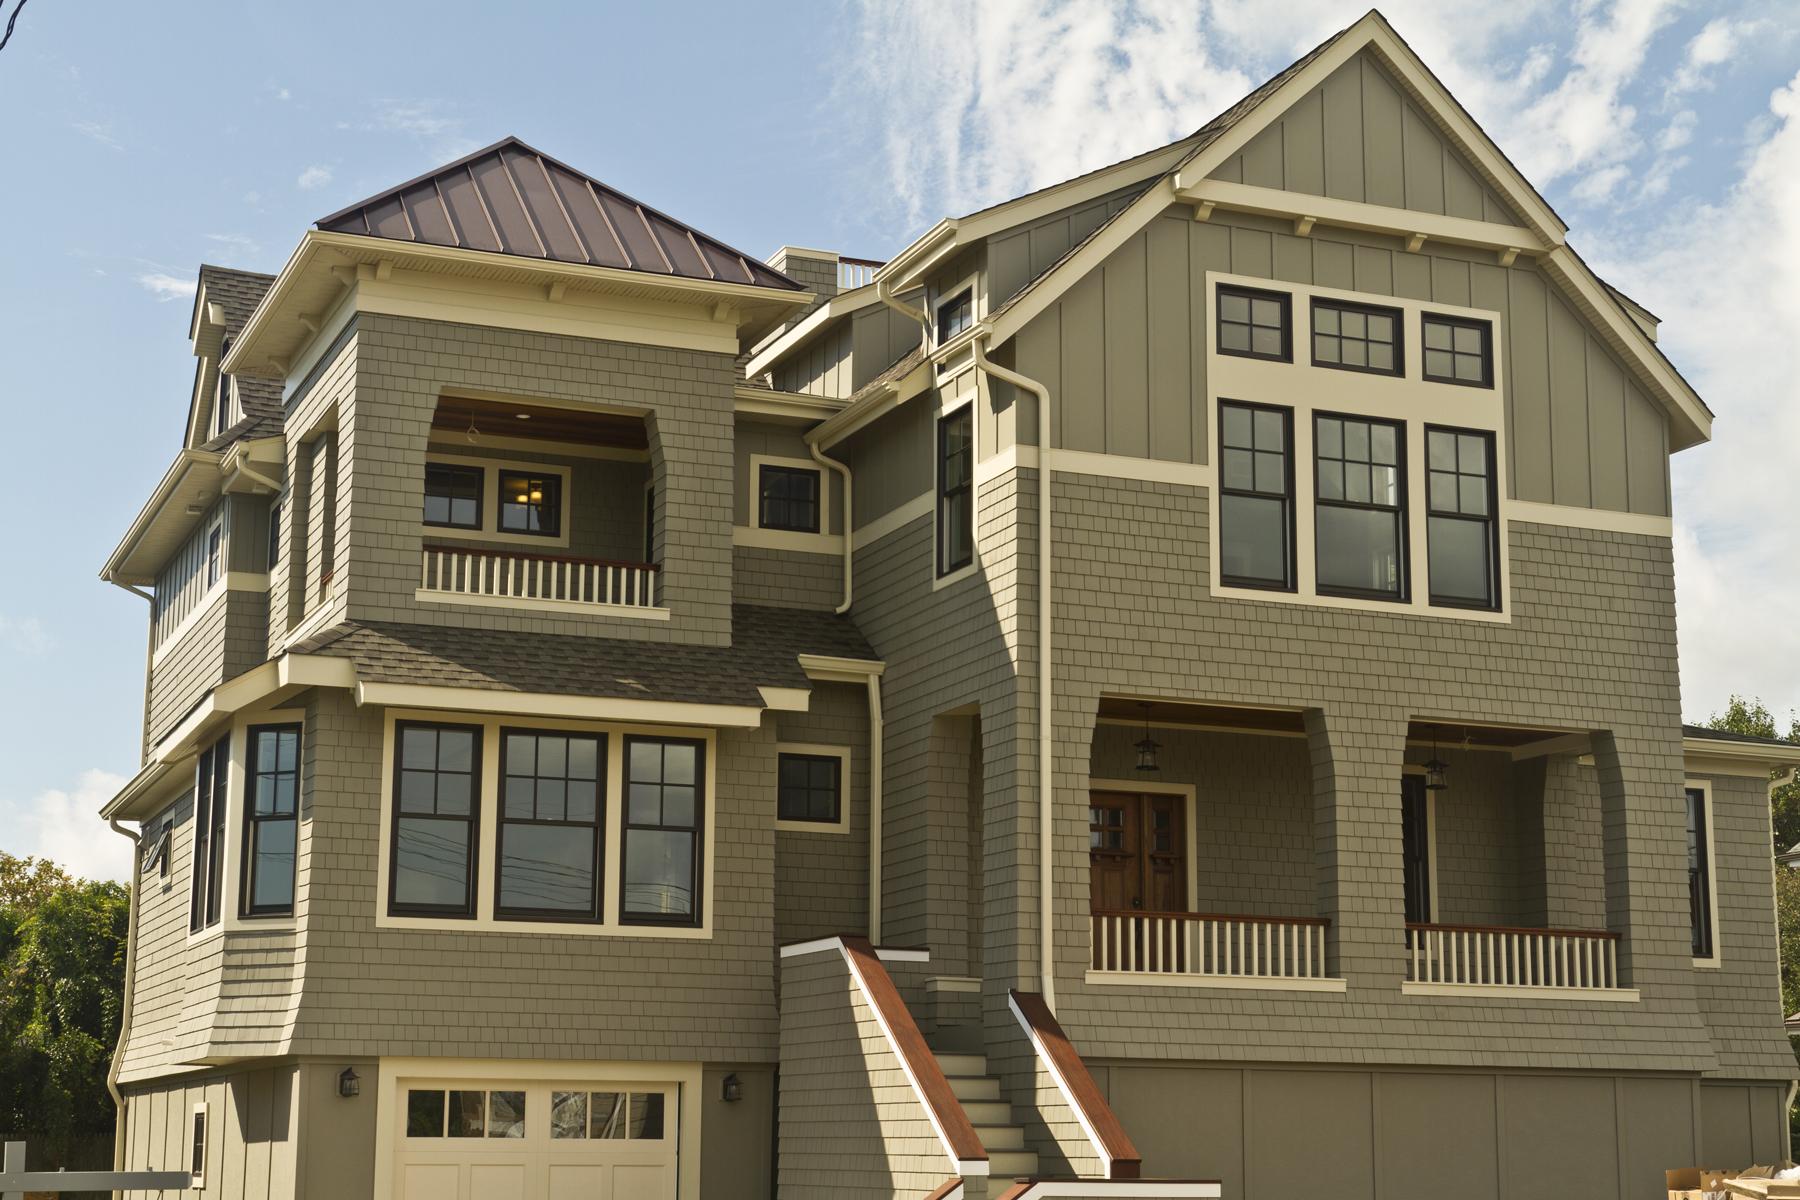 独户住宅 为 销售 在 Newly Constructed Custom Designed Home! 45 Strickland Street 湾头, 新泽西州, 08742 美国